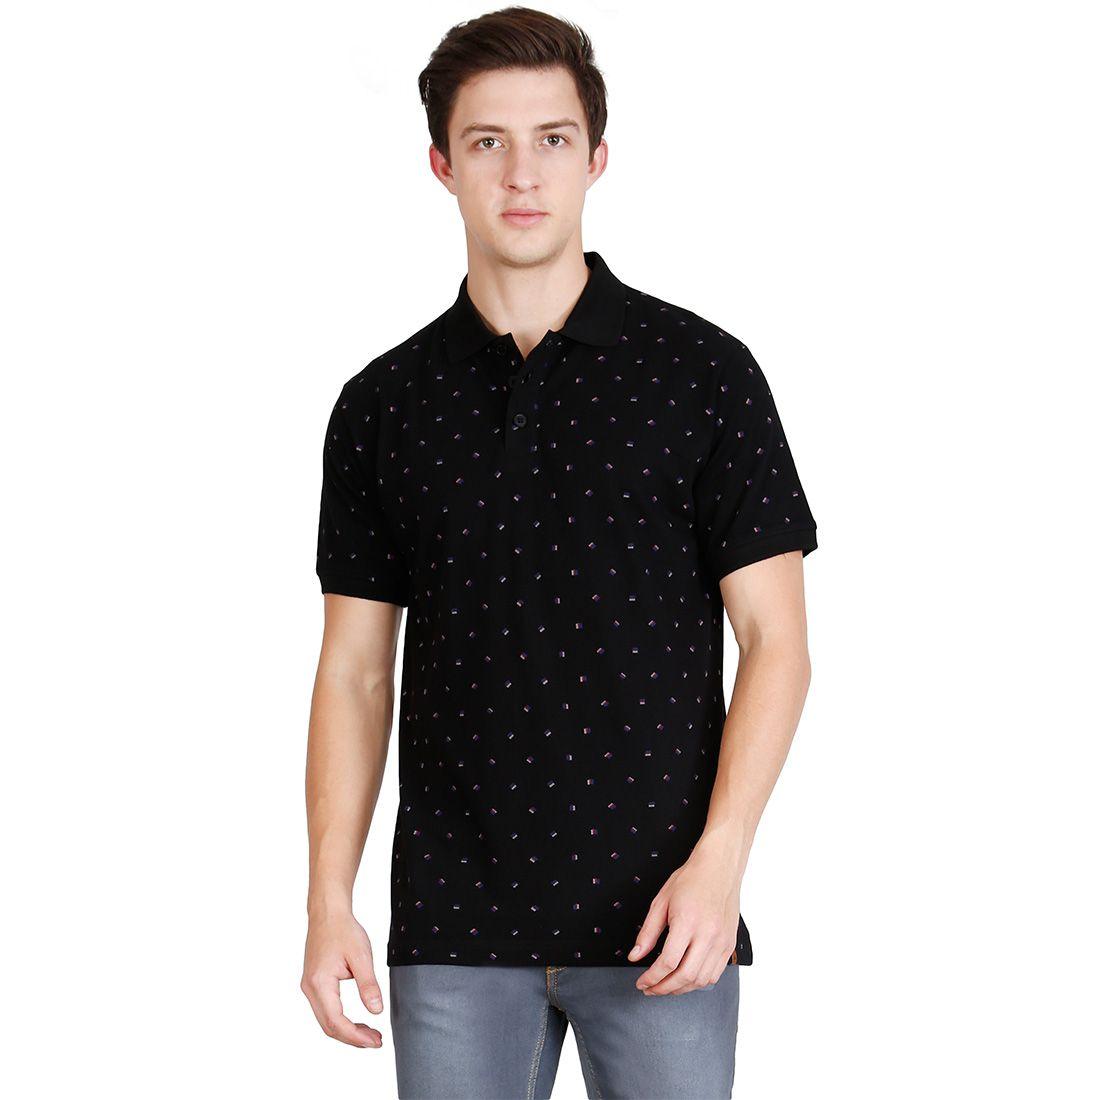 JDC Black Round T-Shirt Pack of 1